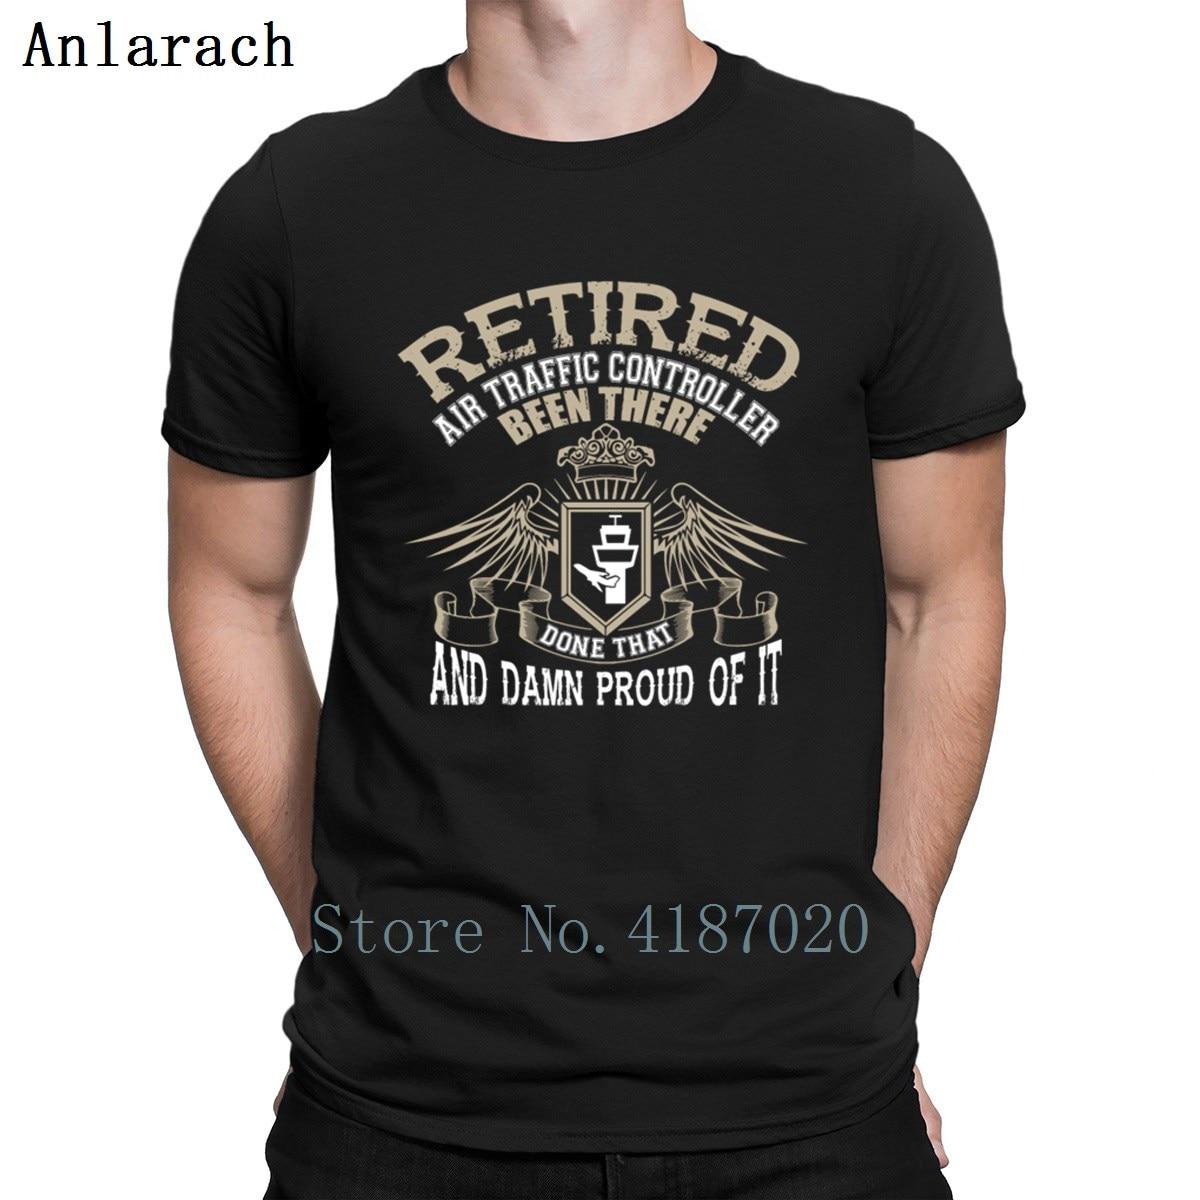 Retired Air Traffic Controller Tshirts Slim Printed Gents Men's Tshirt 2018 Interesting Round Neck Anlarach Hiphop Top